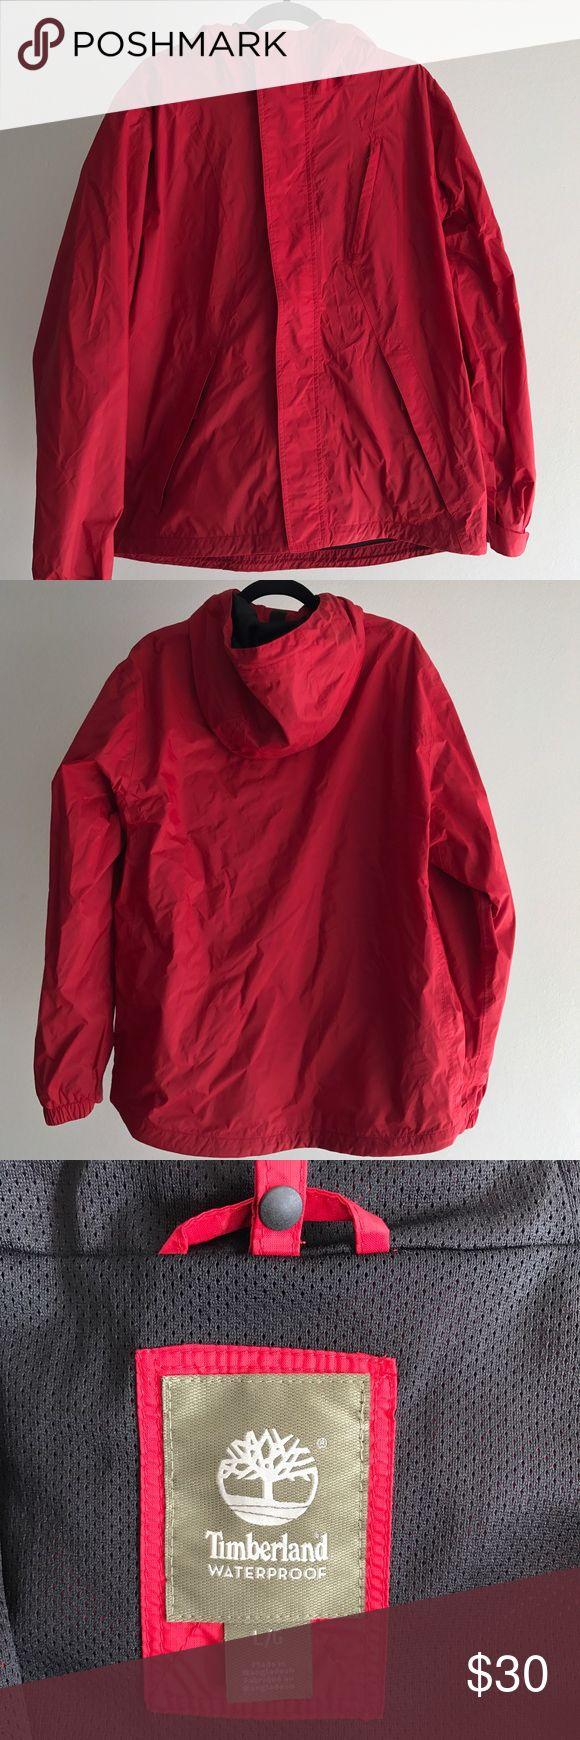 Timberland Men's Rain Jacket Red. Lightweight, rain jacket Timberland Jackets & Coats Raincoats